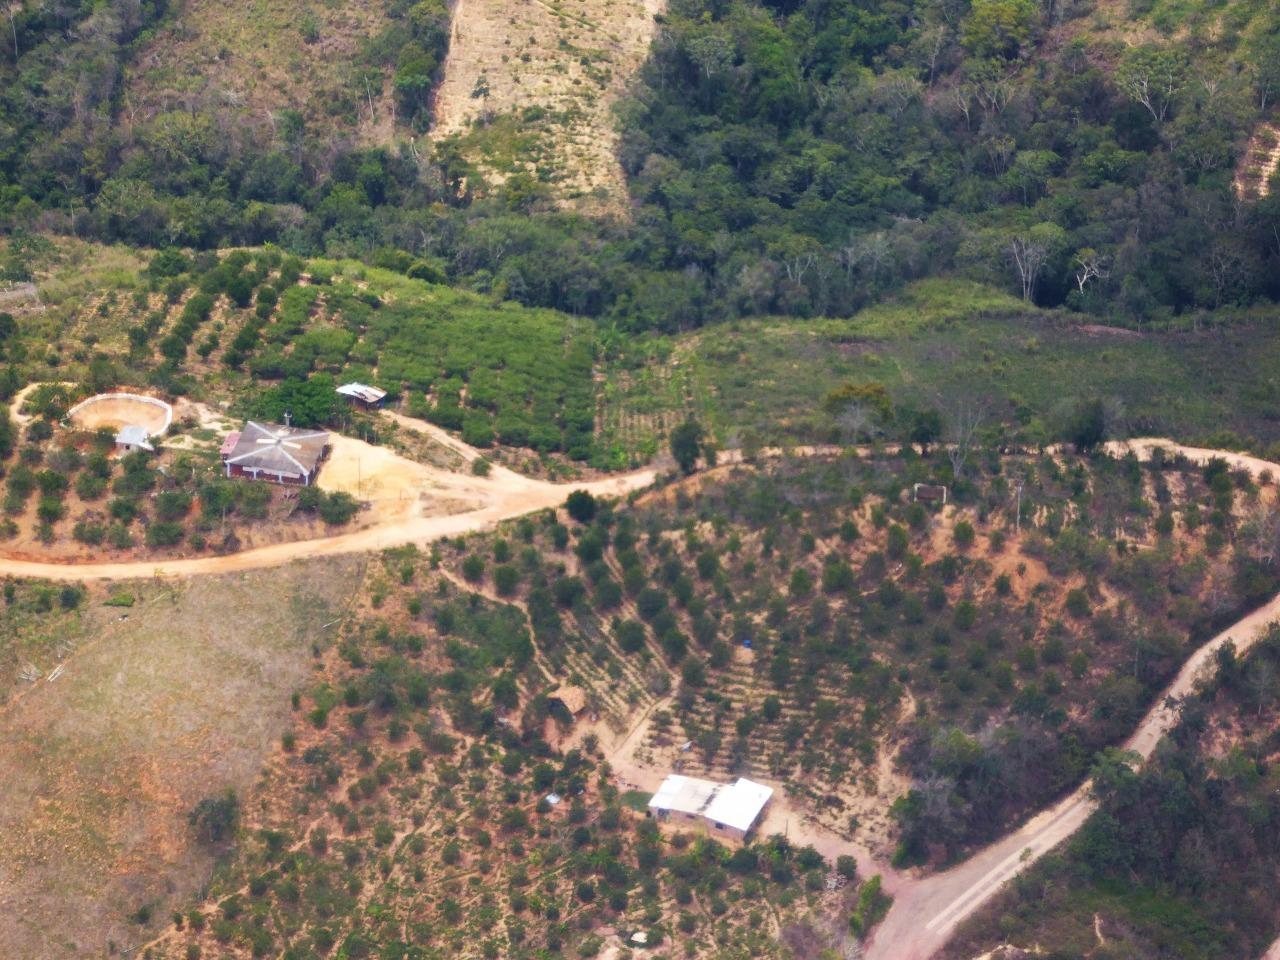 Palm tree plantations